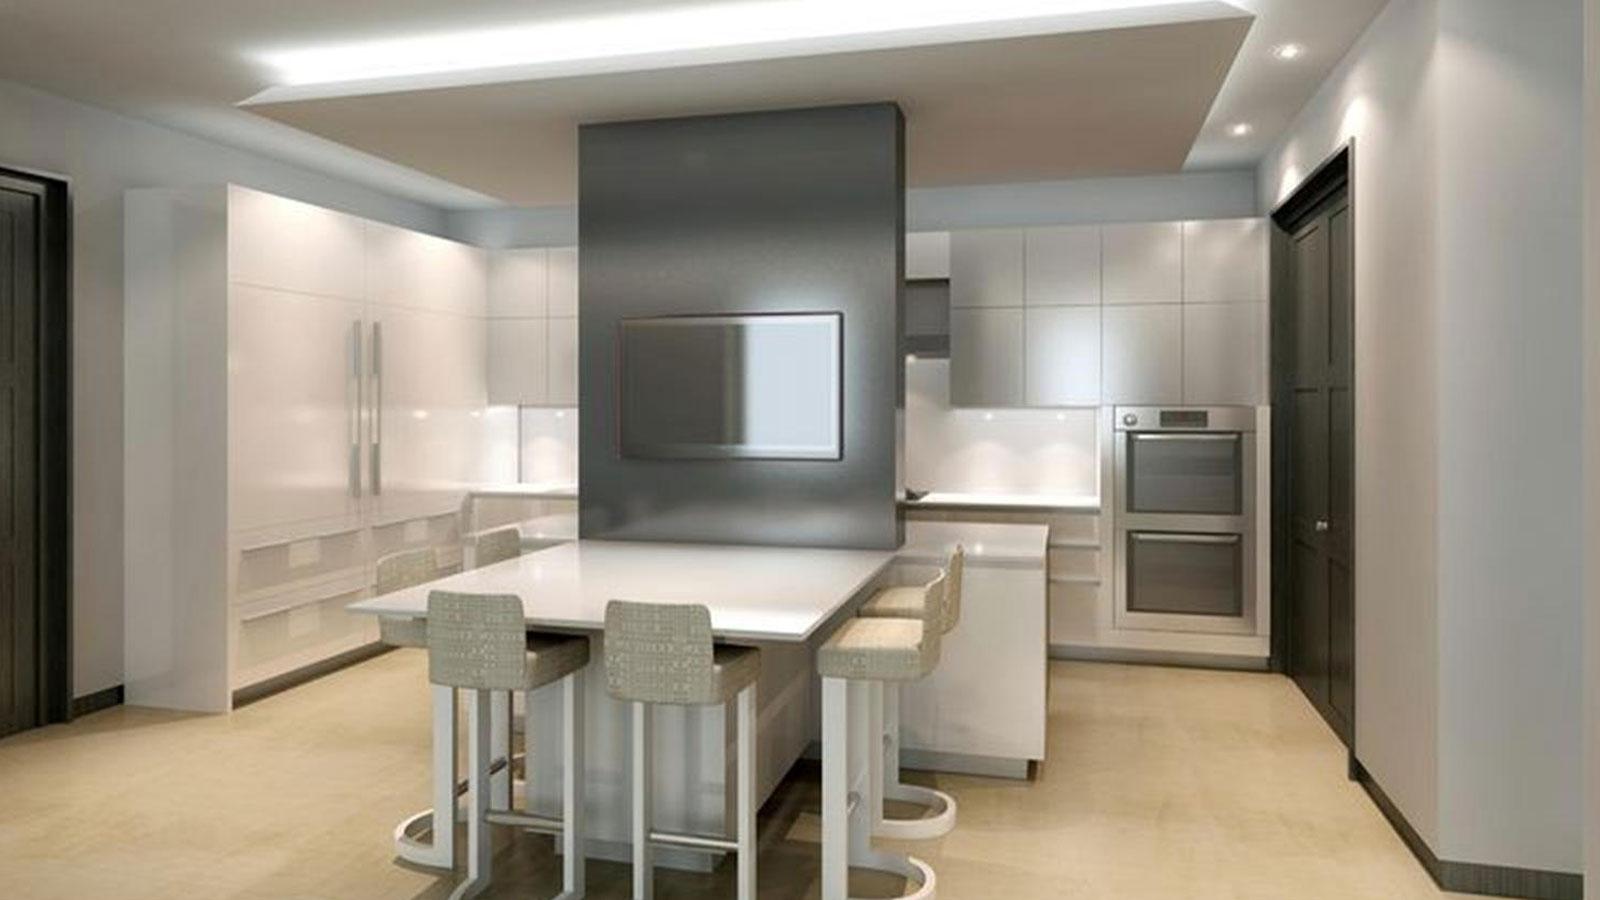 927 Fifth Avenue - NYC Apartments | CityRealty